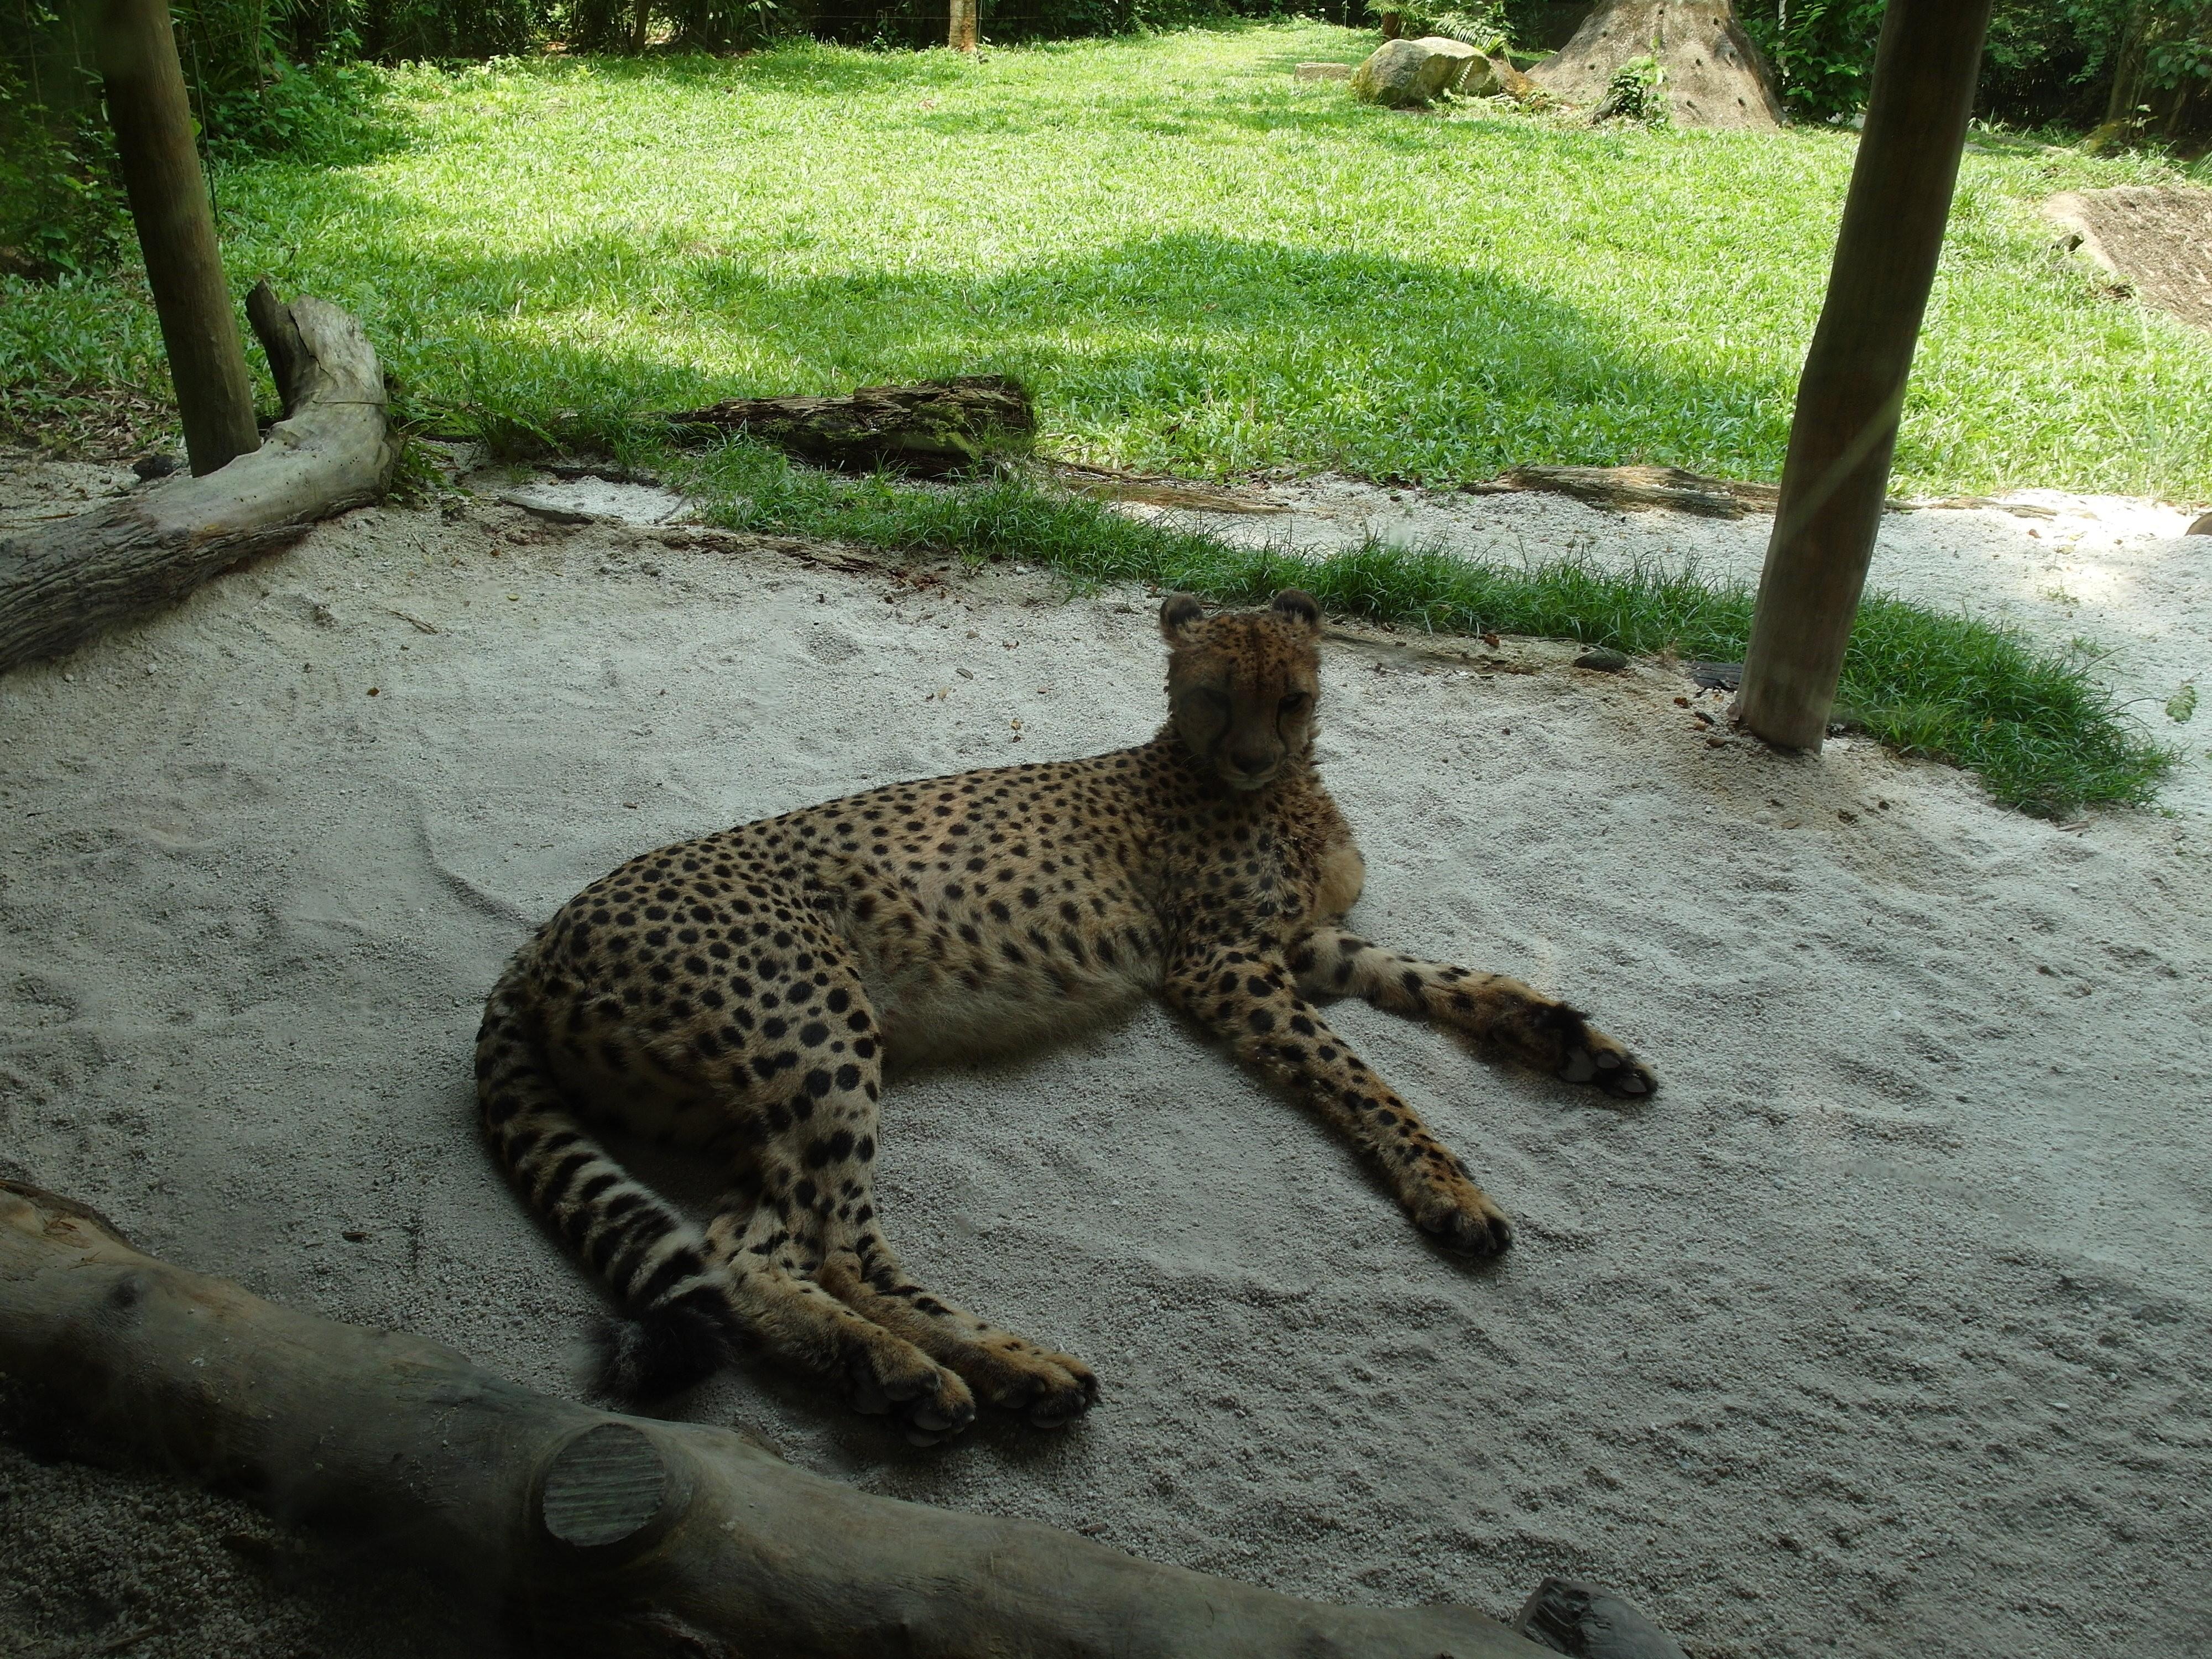 Гепард Cheetah (Acinonyx jubatus), Зоопарк Сингапура